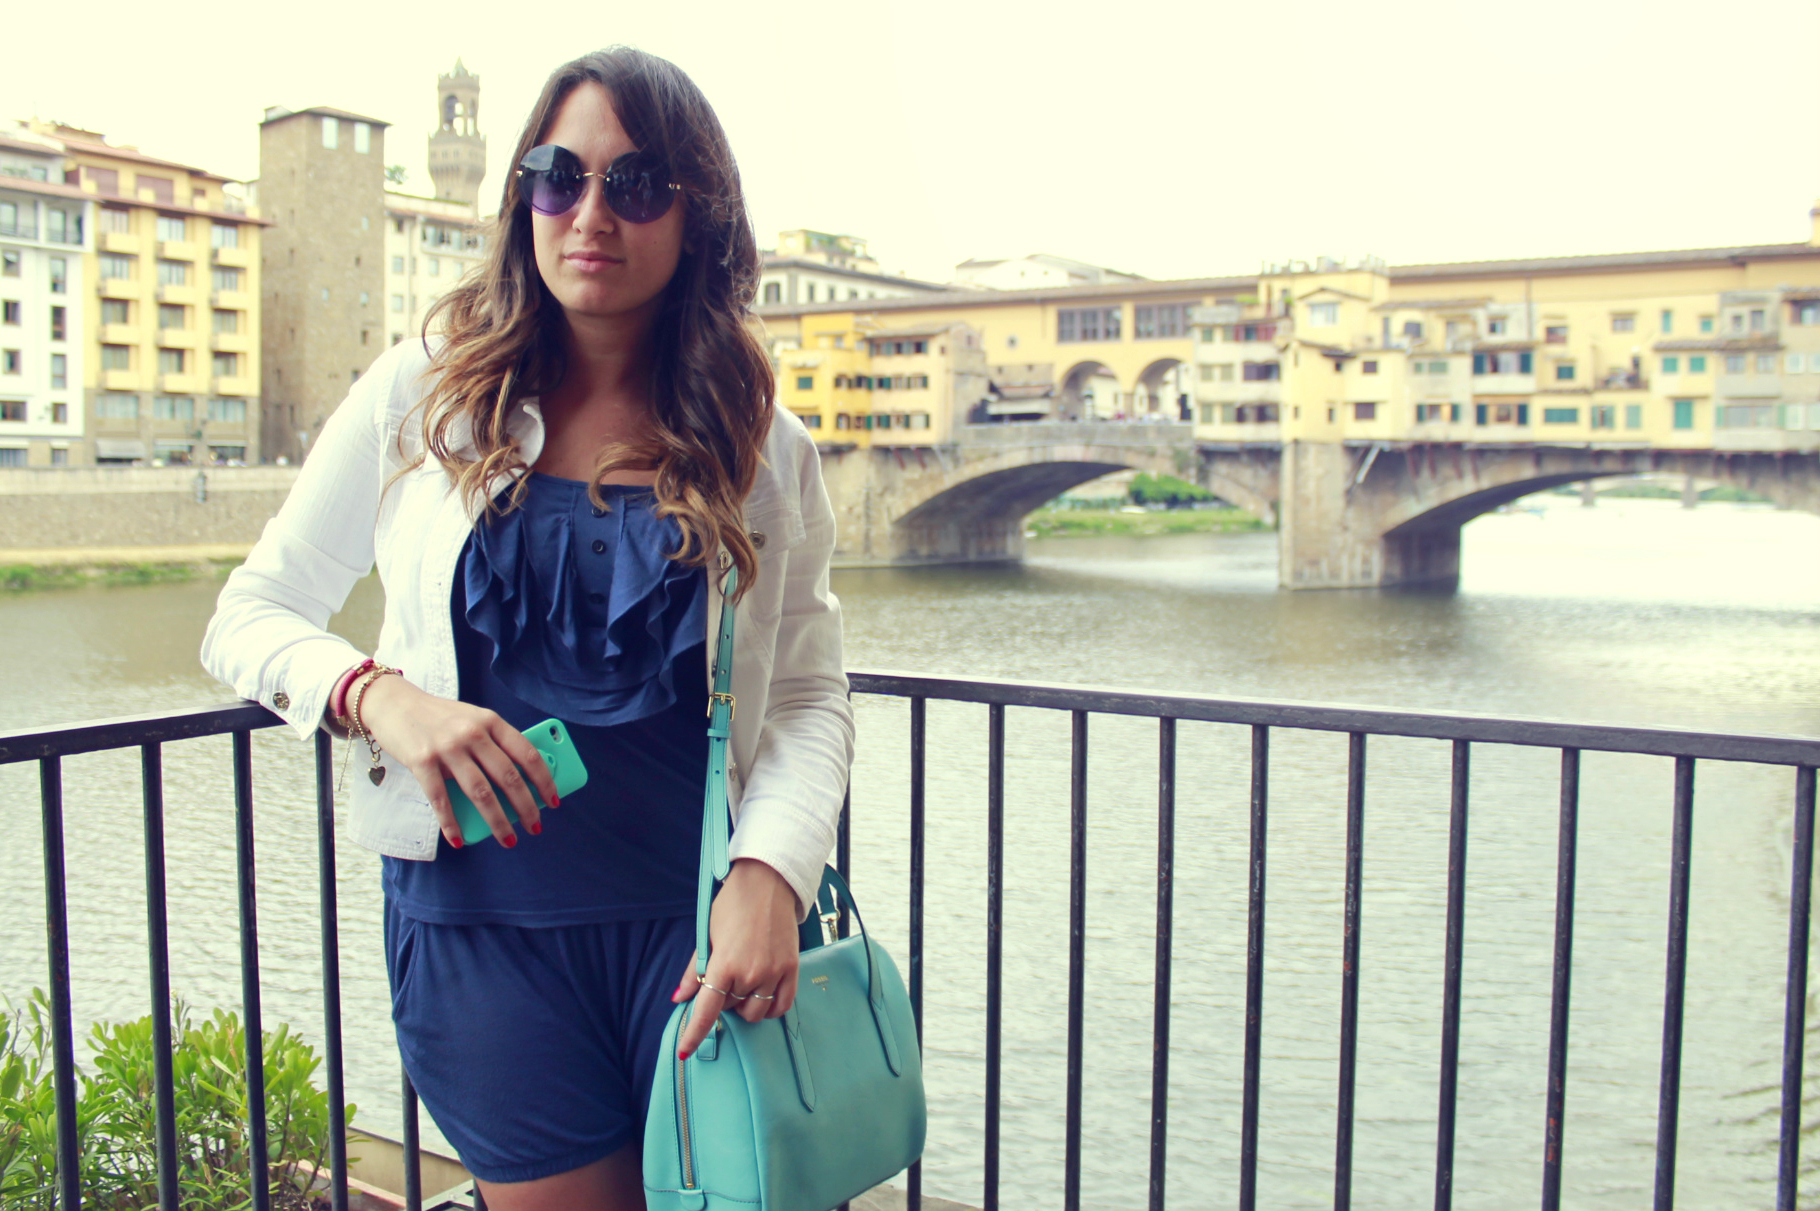 my glamour attitude, fashion blog, firenze, maria giovanna abagnale, pitti, luisaviaroma, ponte vecchio, florence, travel, fossil, lolita lempicka